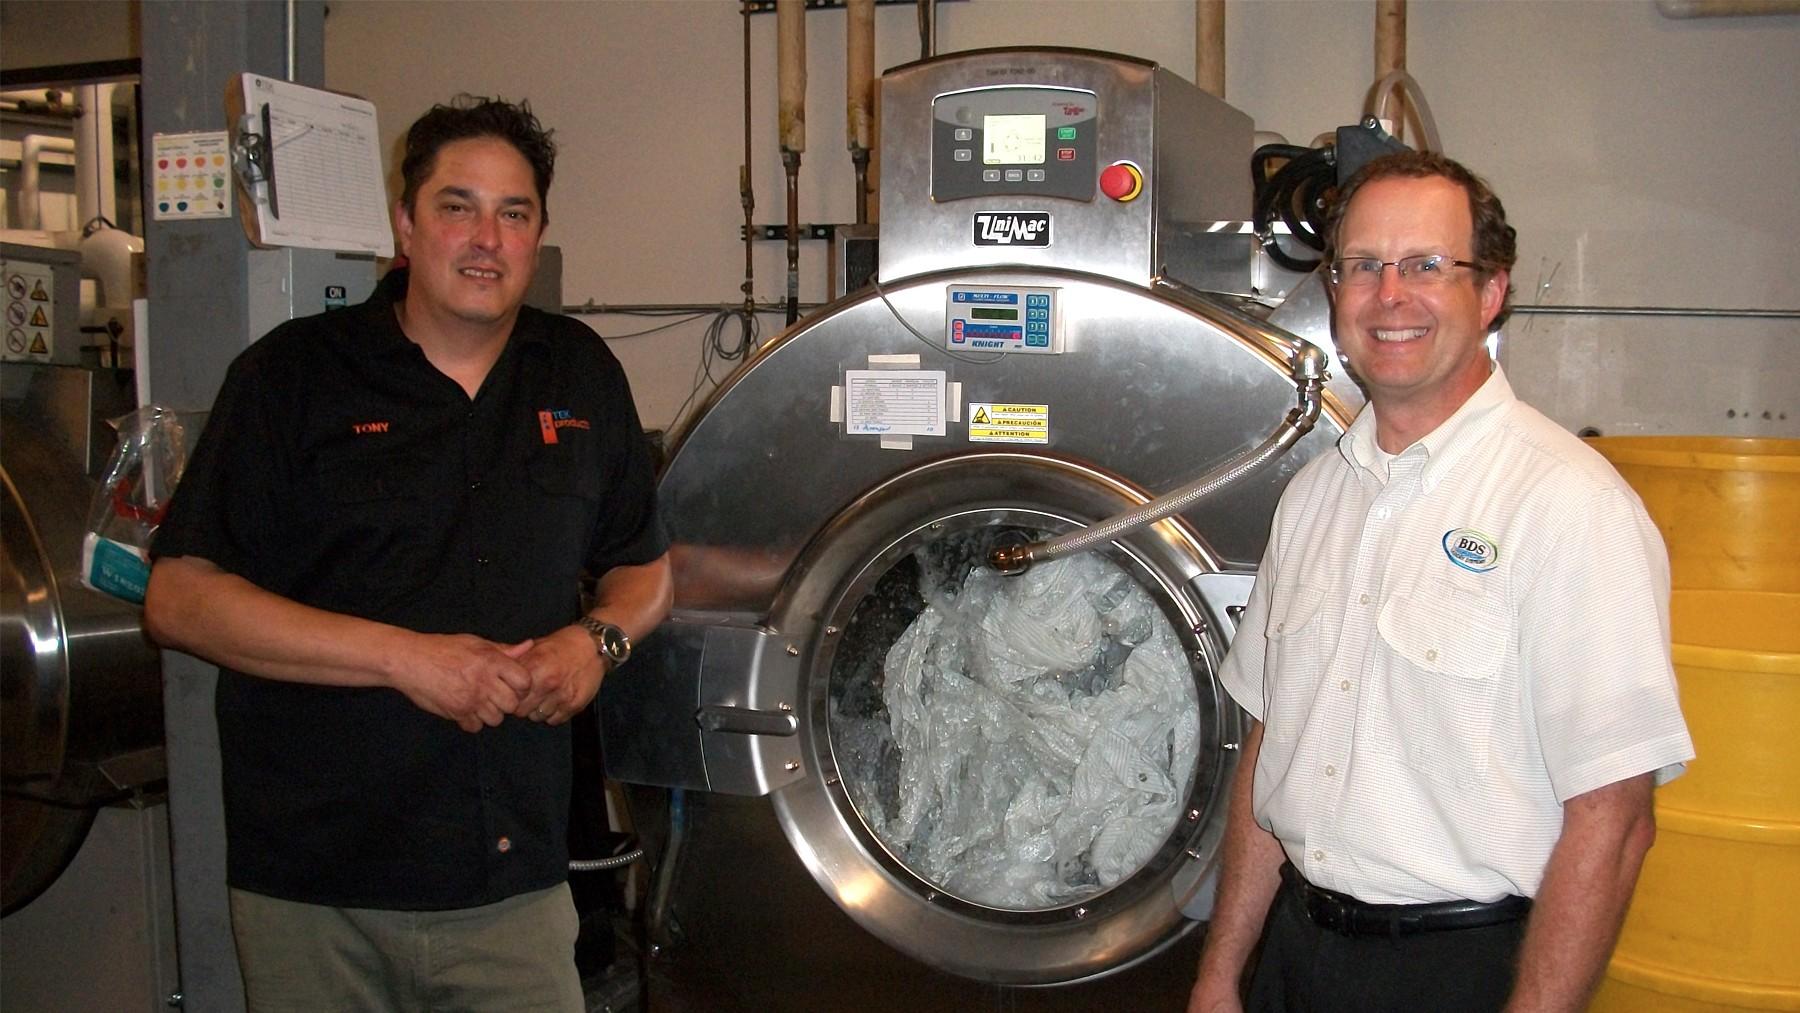 TEK Products Unimac BDS Laundry Systems